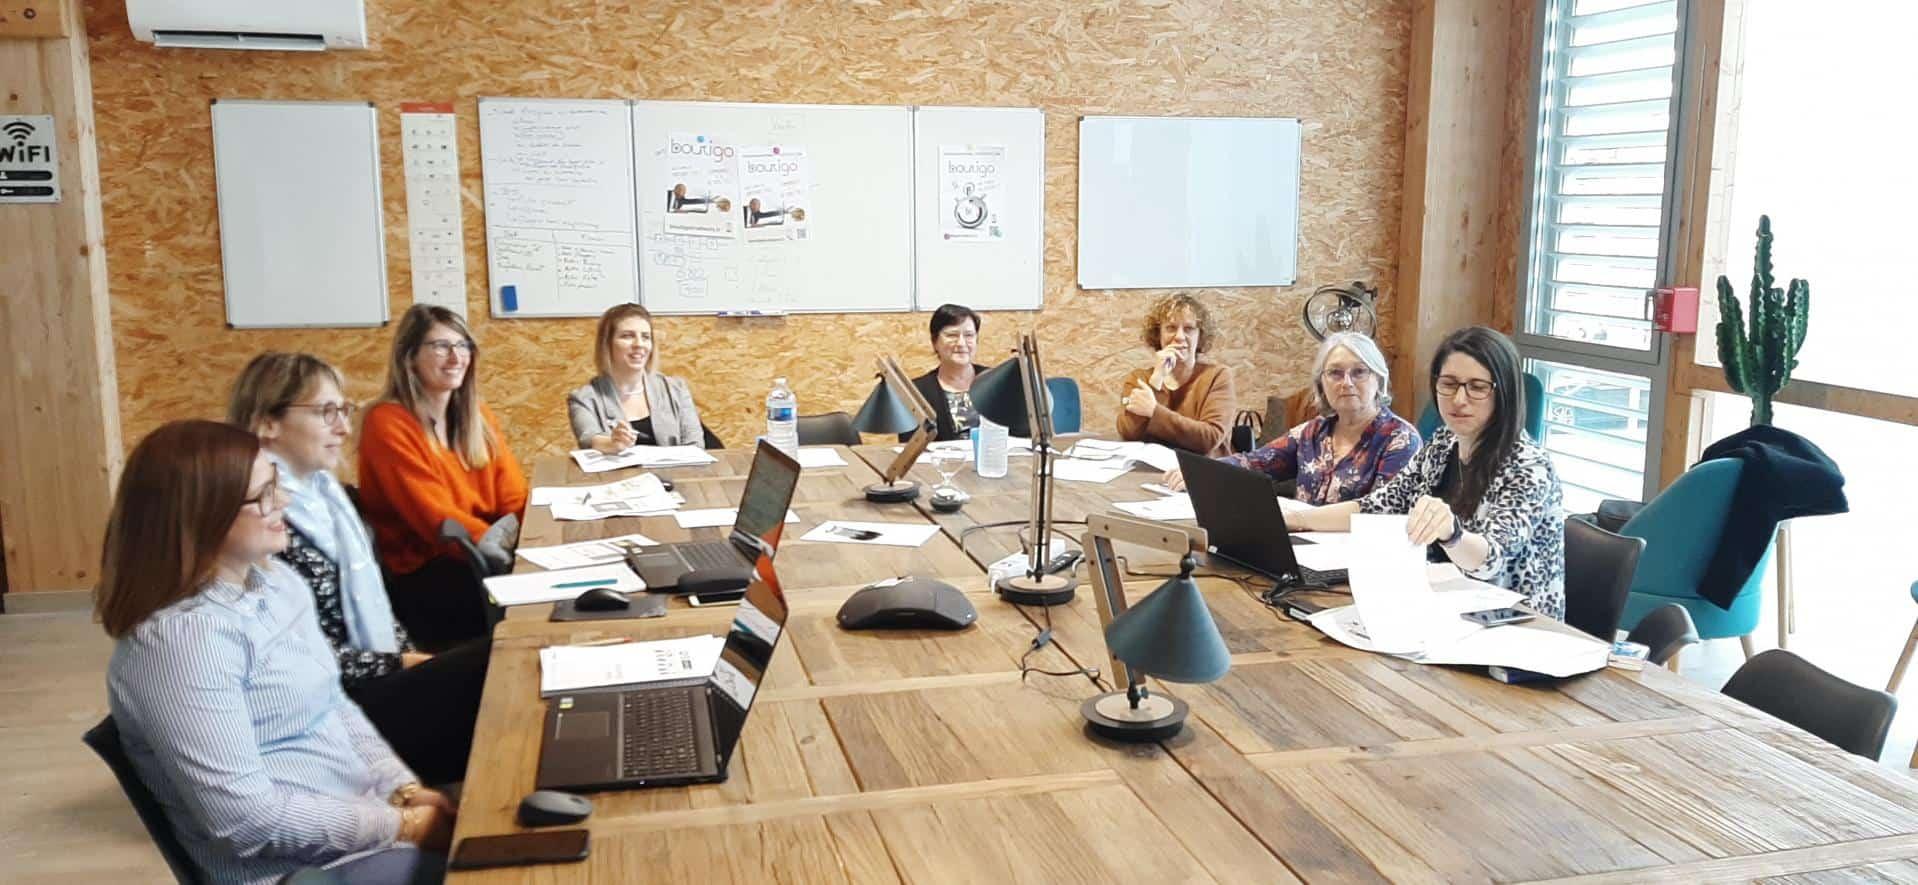 formation collective logiciel arg famille